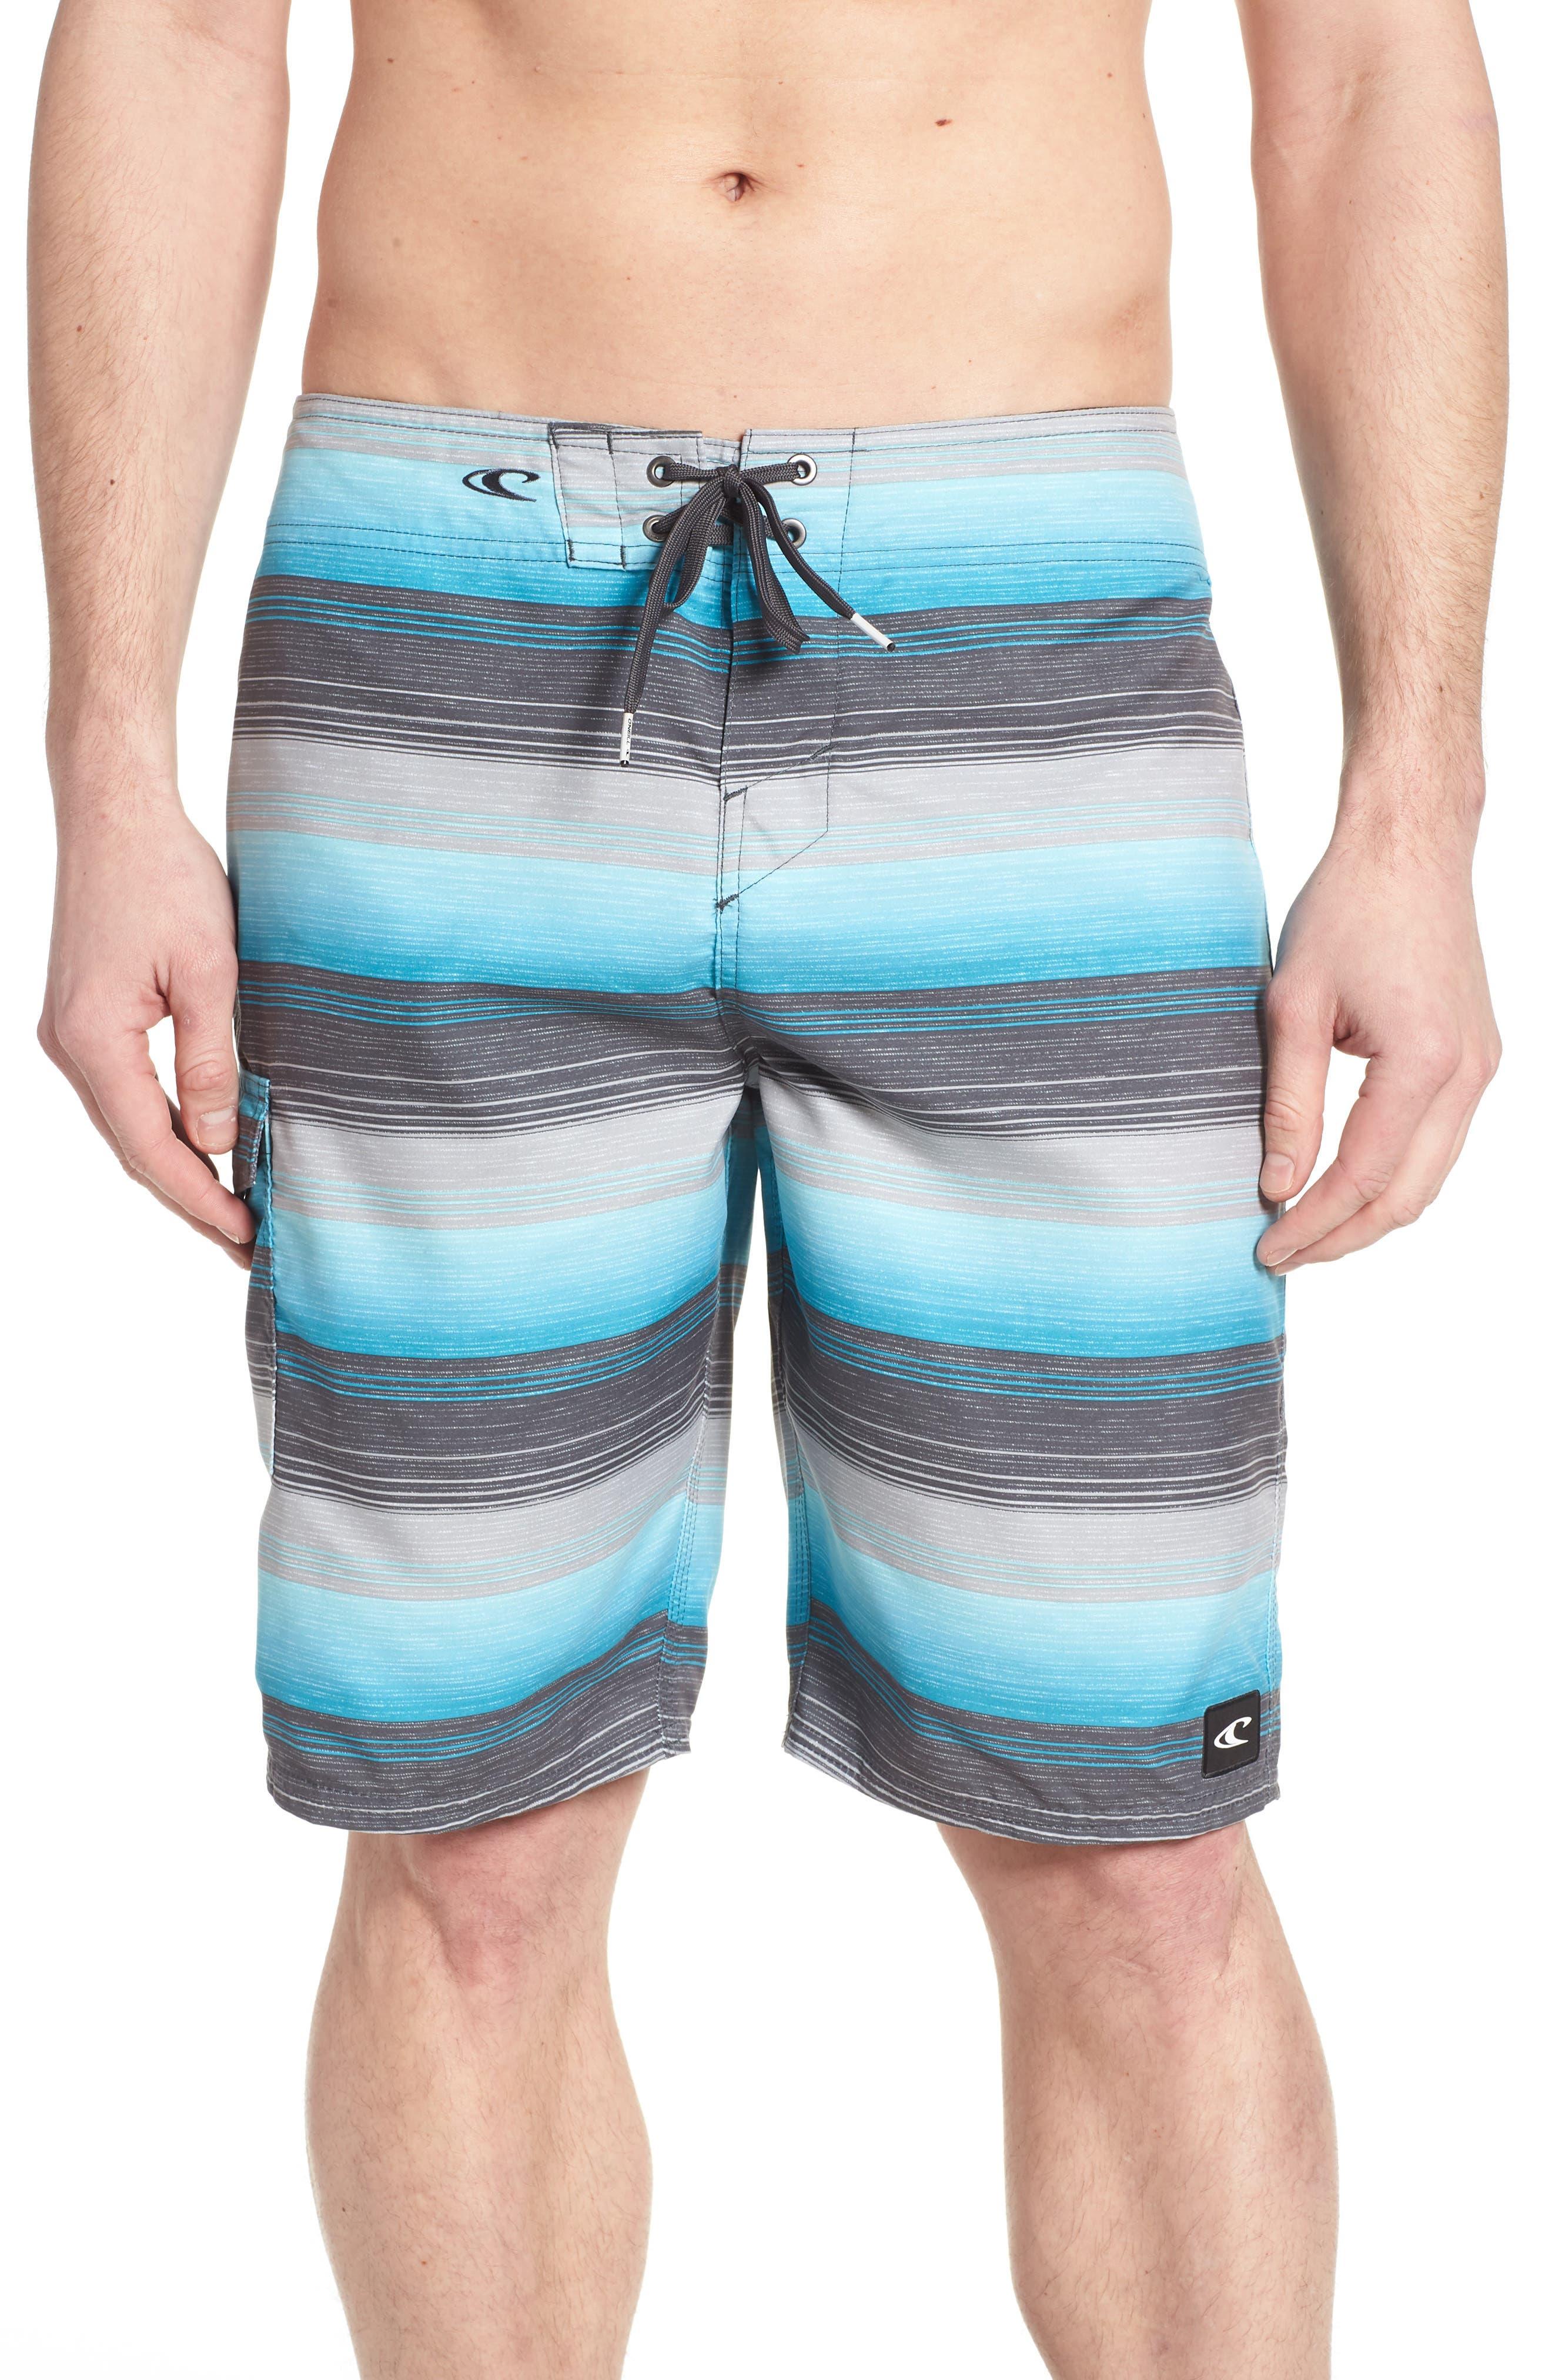 Santa Cruz Board Shorts,                         Main,                         color, Ocean